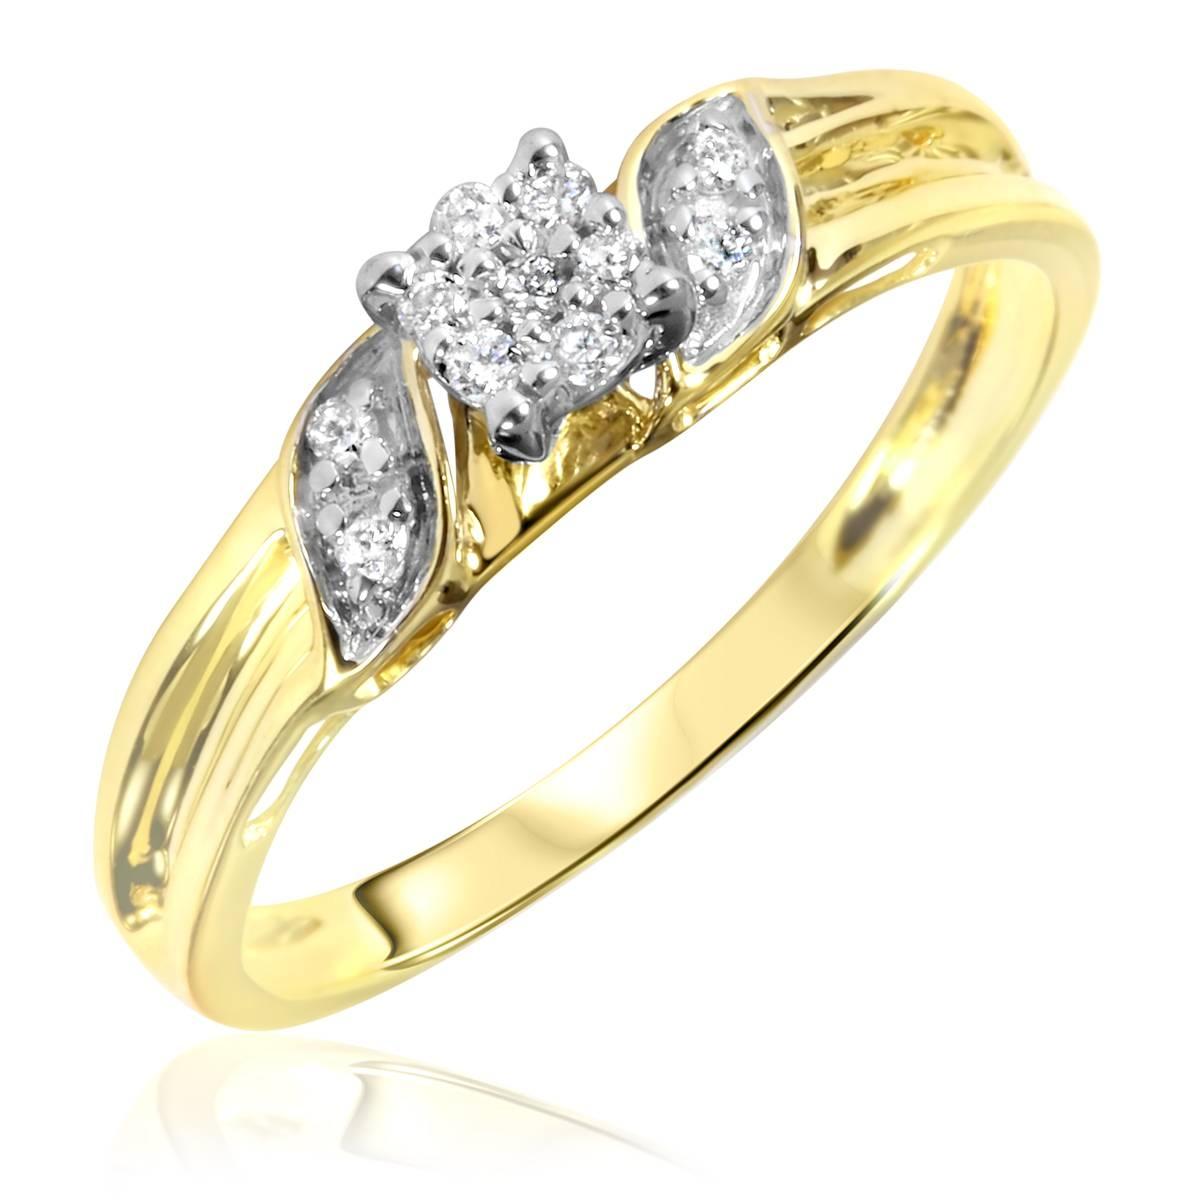 1/4 Carat Diamond Trio Wedding Ring Set 10k Yellow Gold With Regard To Wedding Engagement Ring Sets (View 11 of 15)